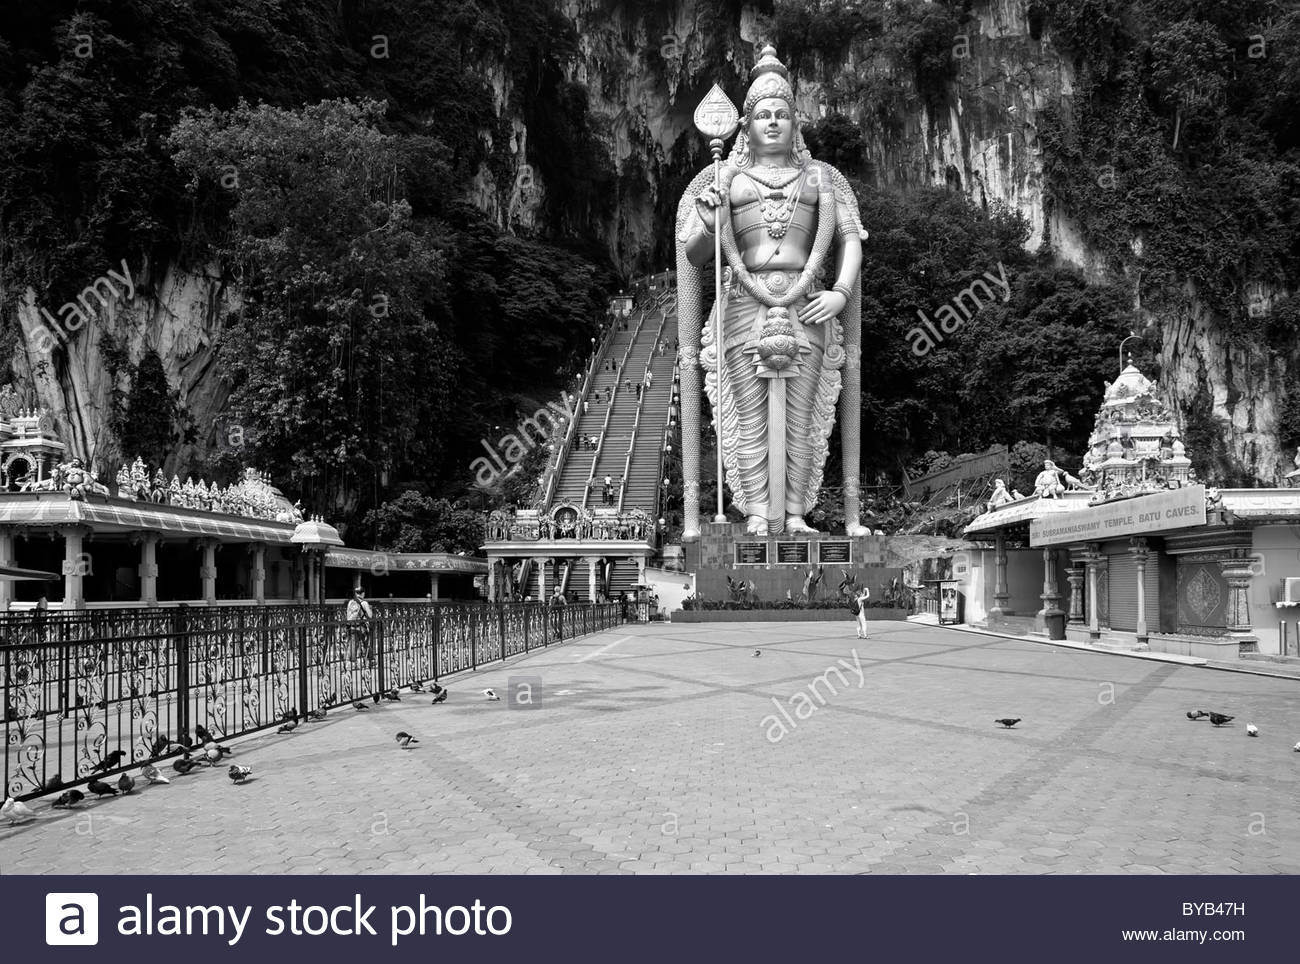 statue of the god Murugan at the forecourt of the Batu Caves, creative, limestone caves near Kuala Lumpur, Malaysia, - Stock Image